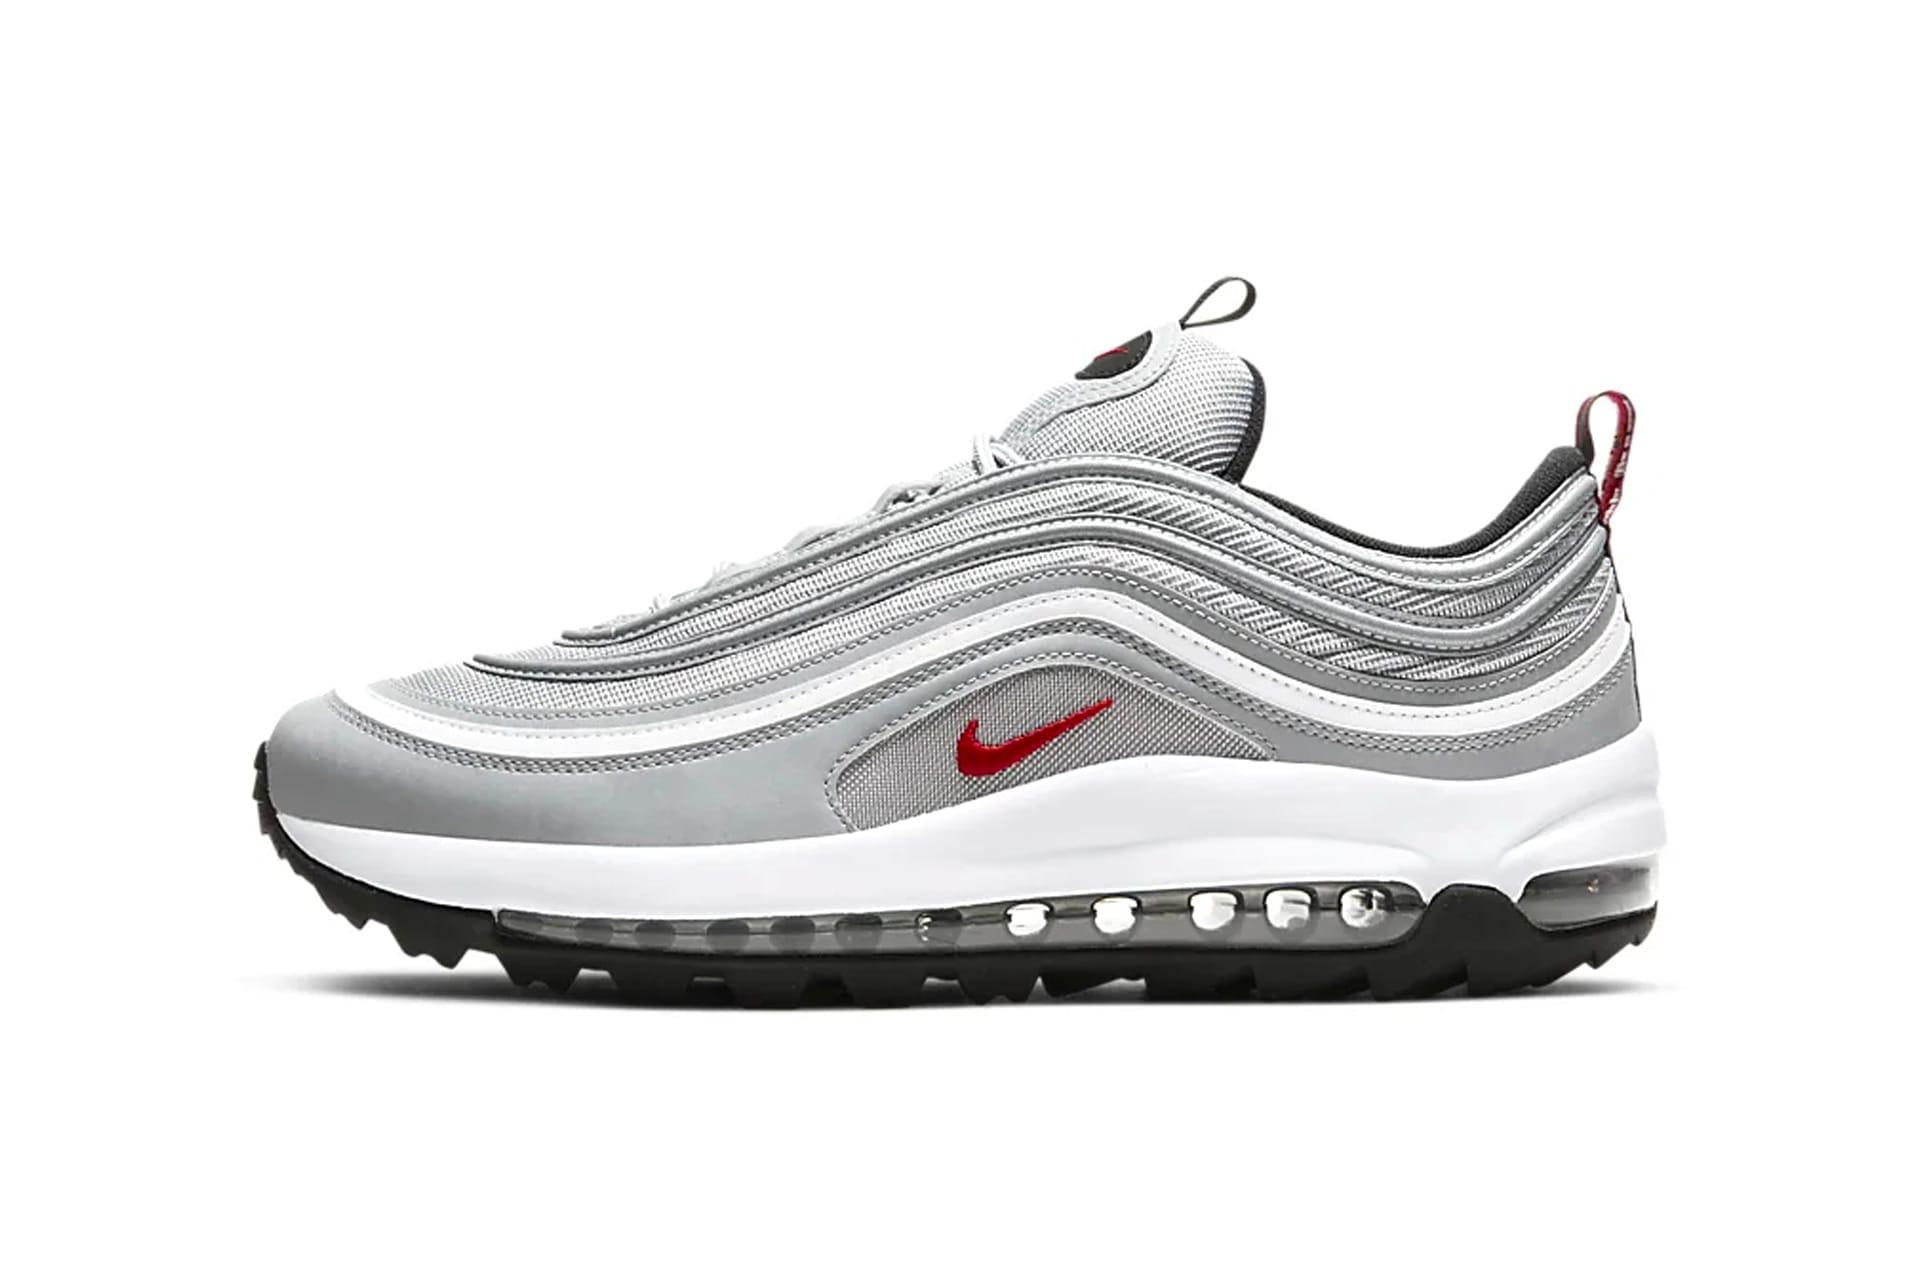 silver and black air max 97